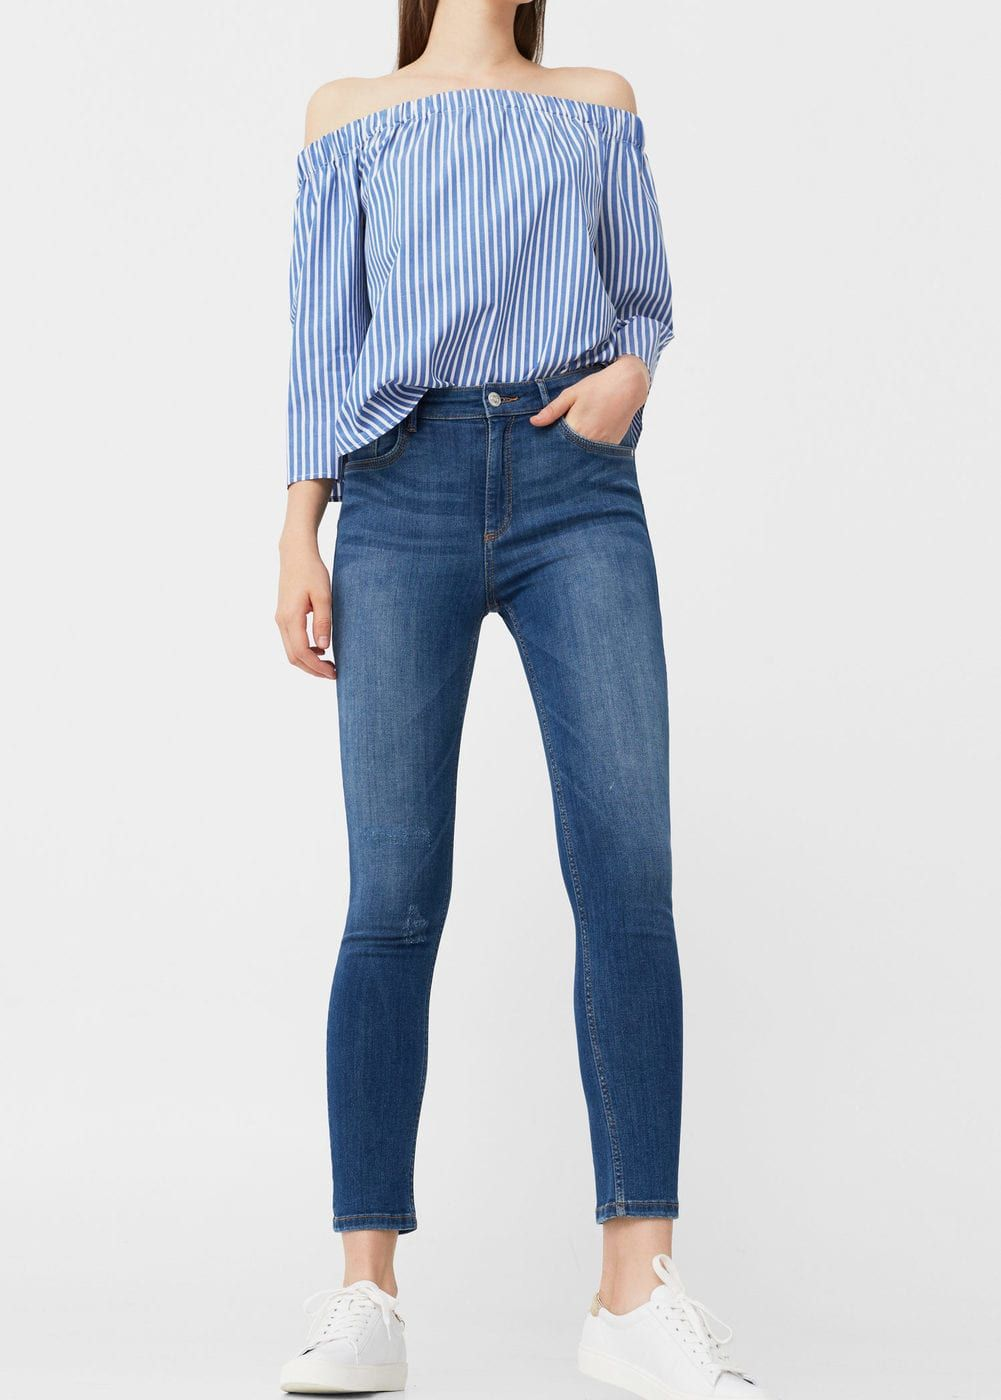 Jeans skinny noa - Jeans de Mujer  ccb5801fc03